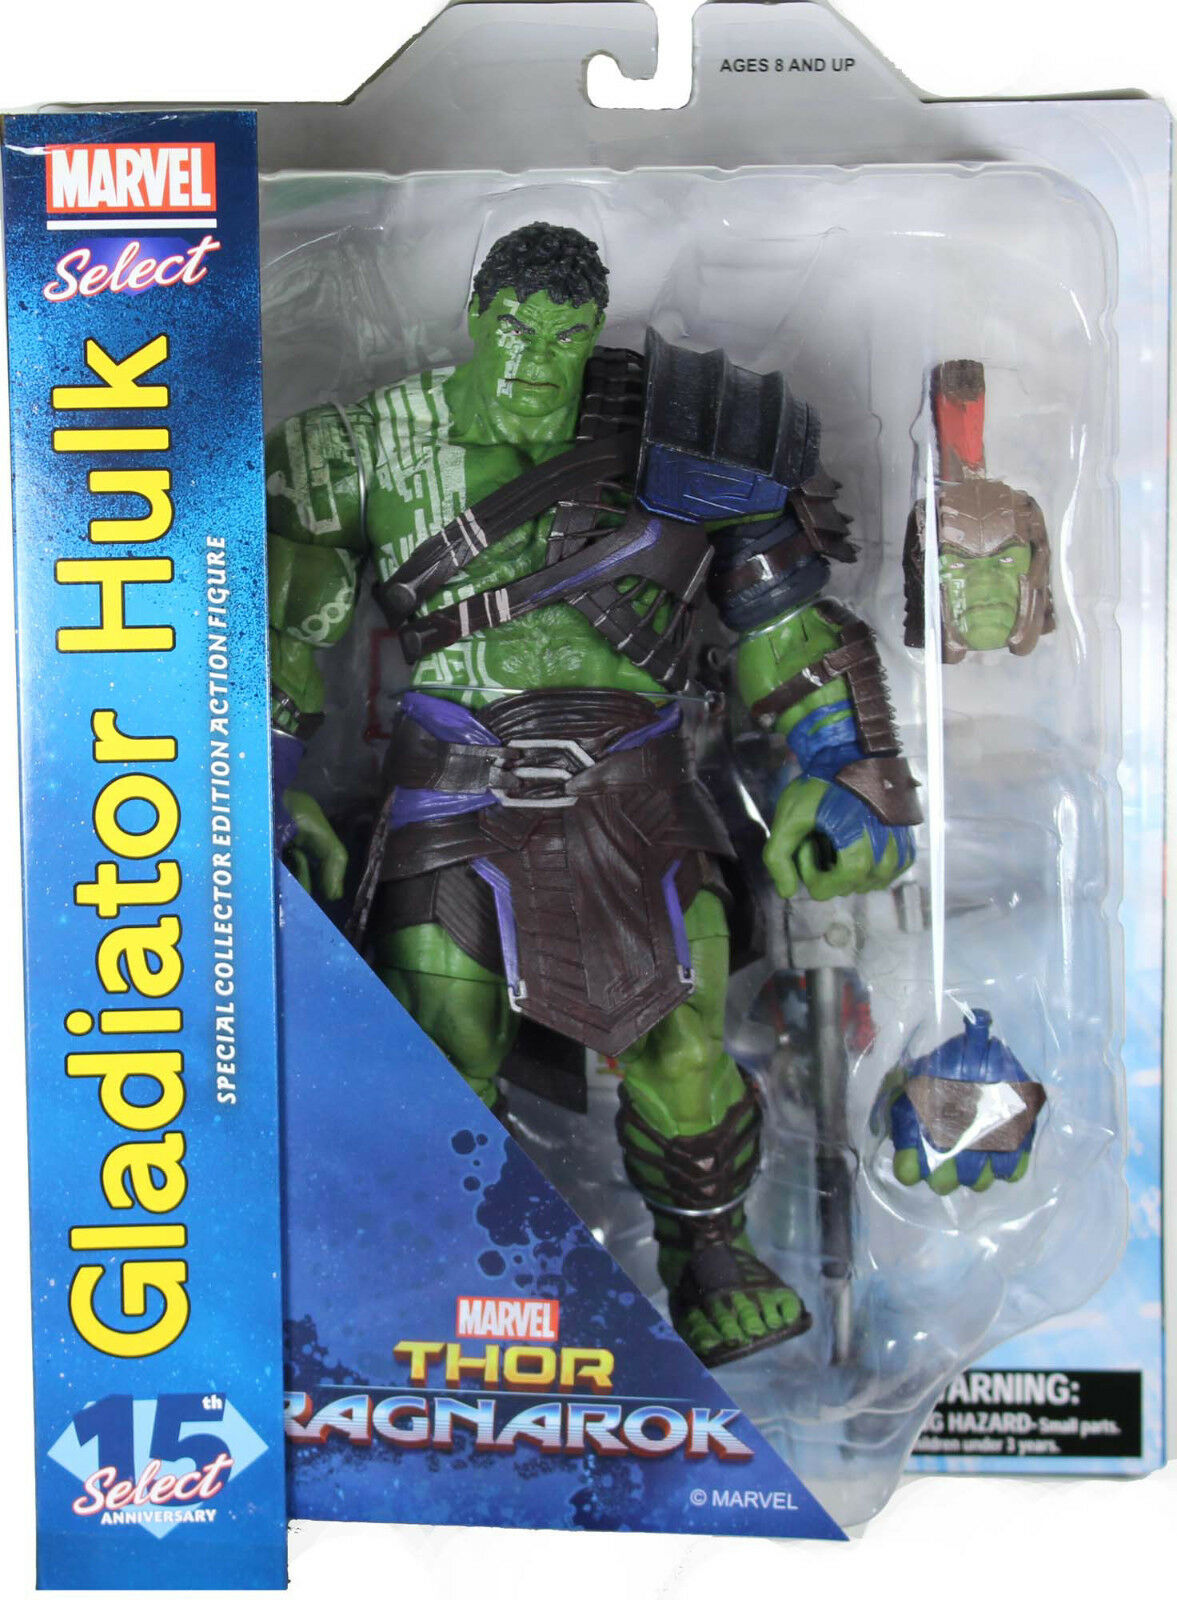 2018 Thor Ragnarok Gladiator Hulk Action Figure Avengers Collectible Toy Gift